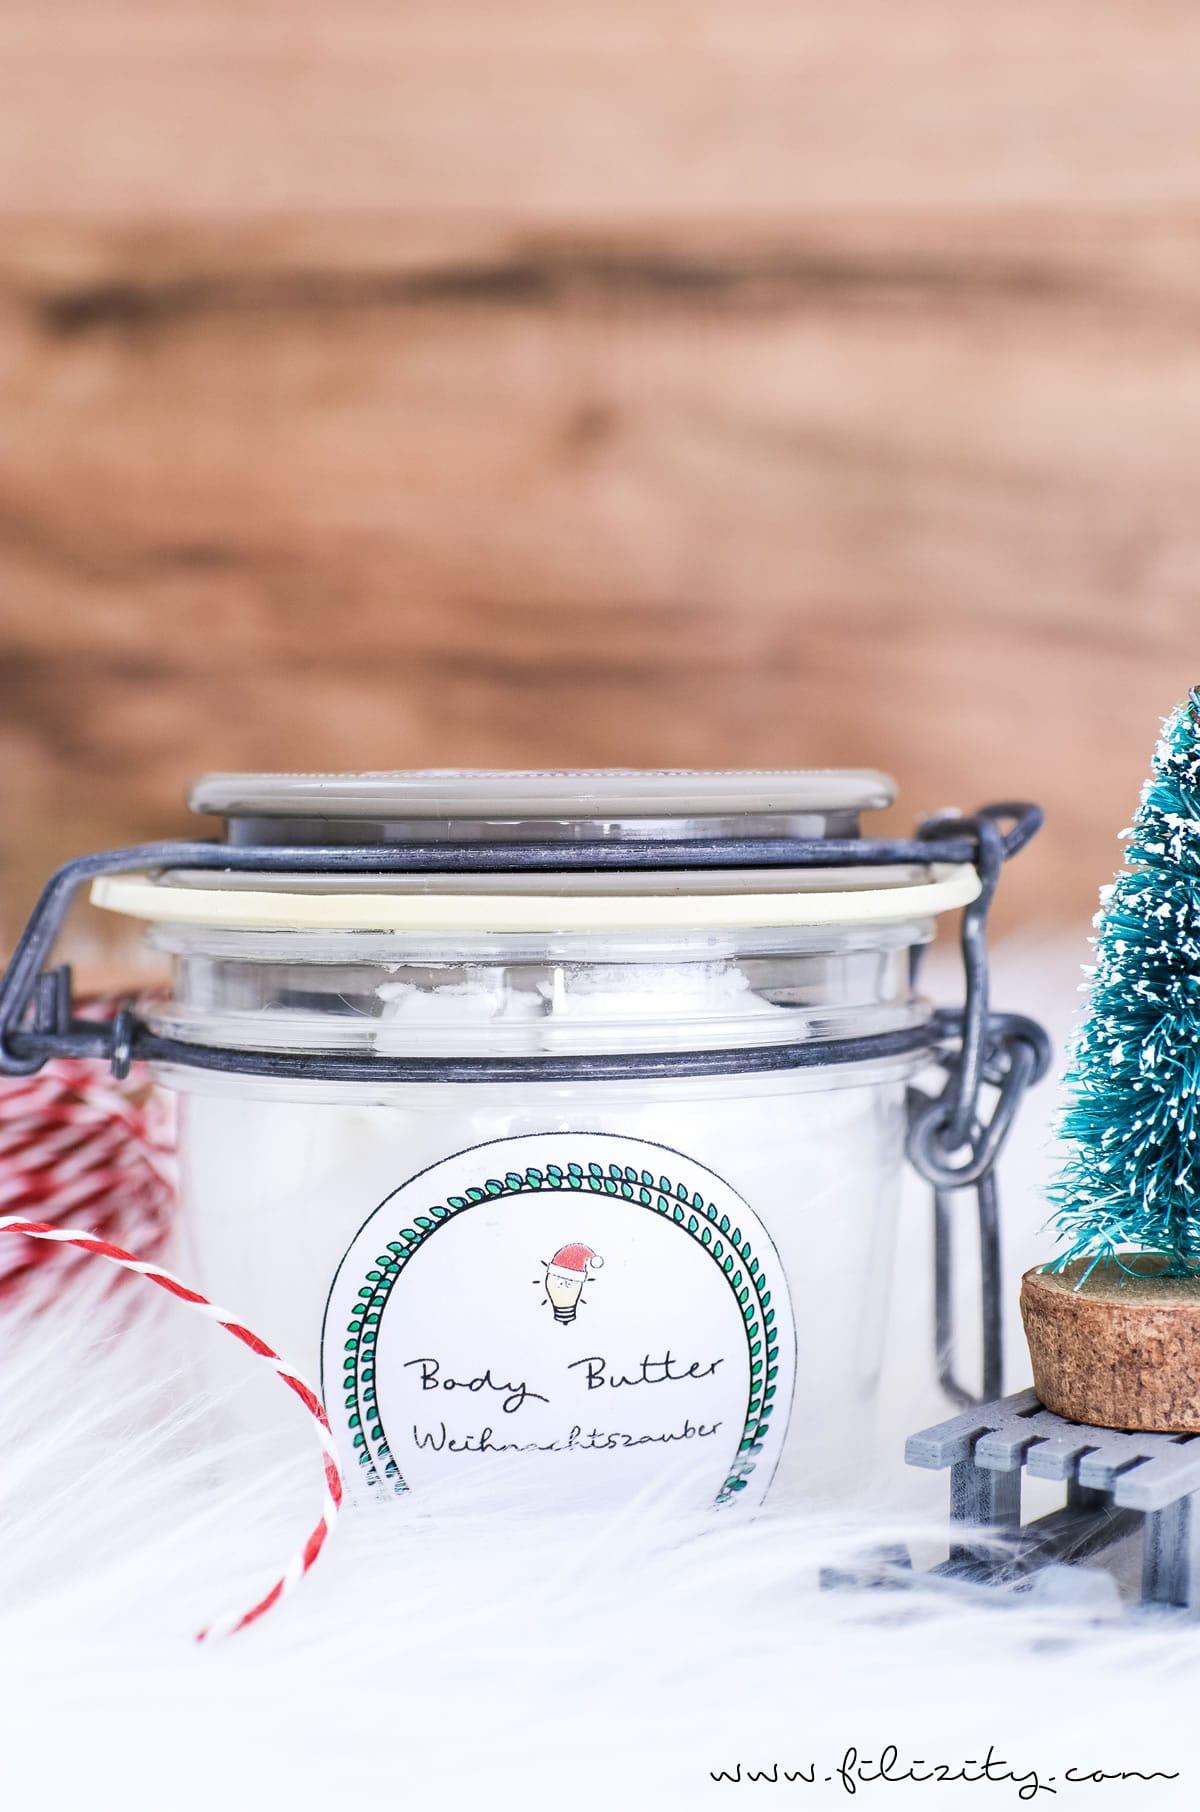 diy-last-minute-weihnachtsgeschenk-body-butter-naturkosmetik-selber ...